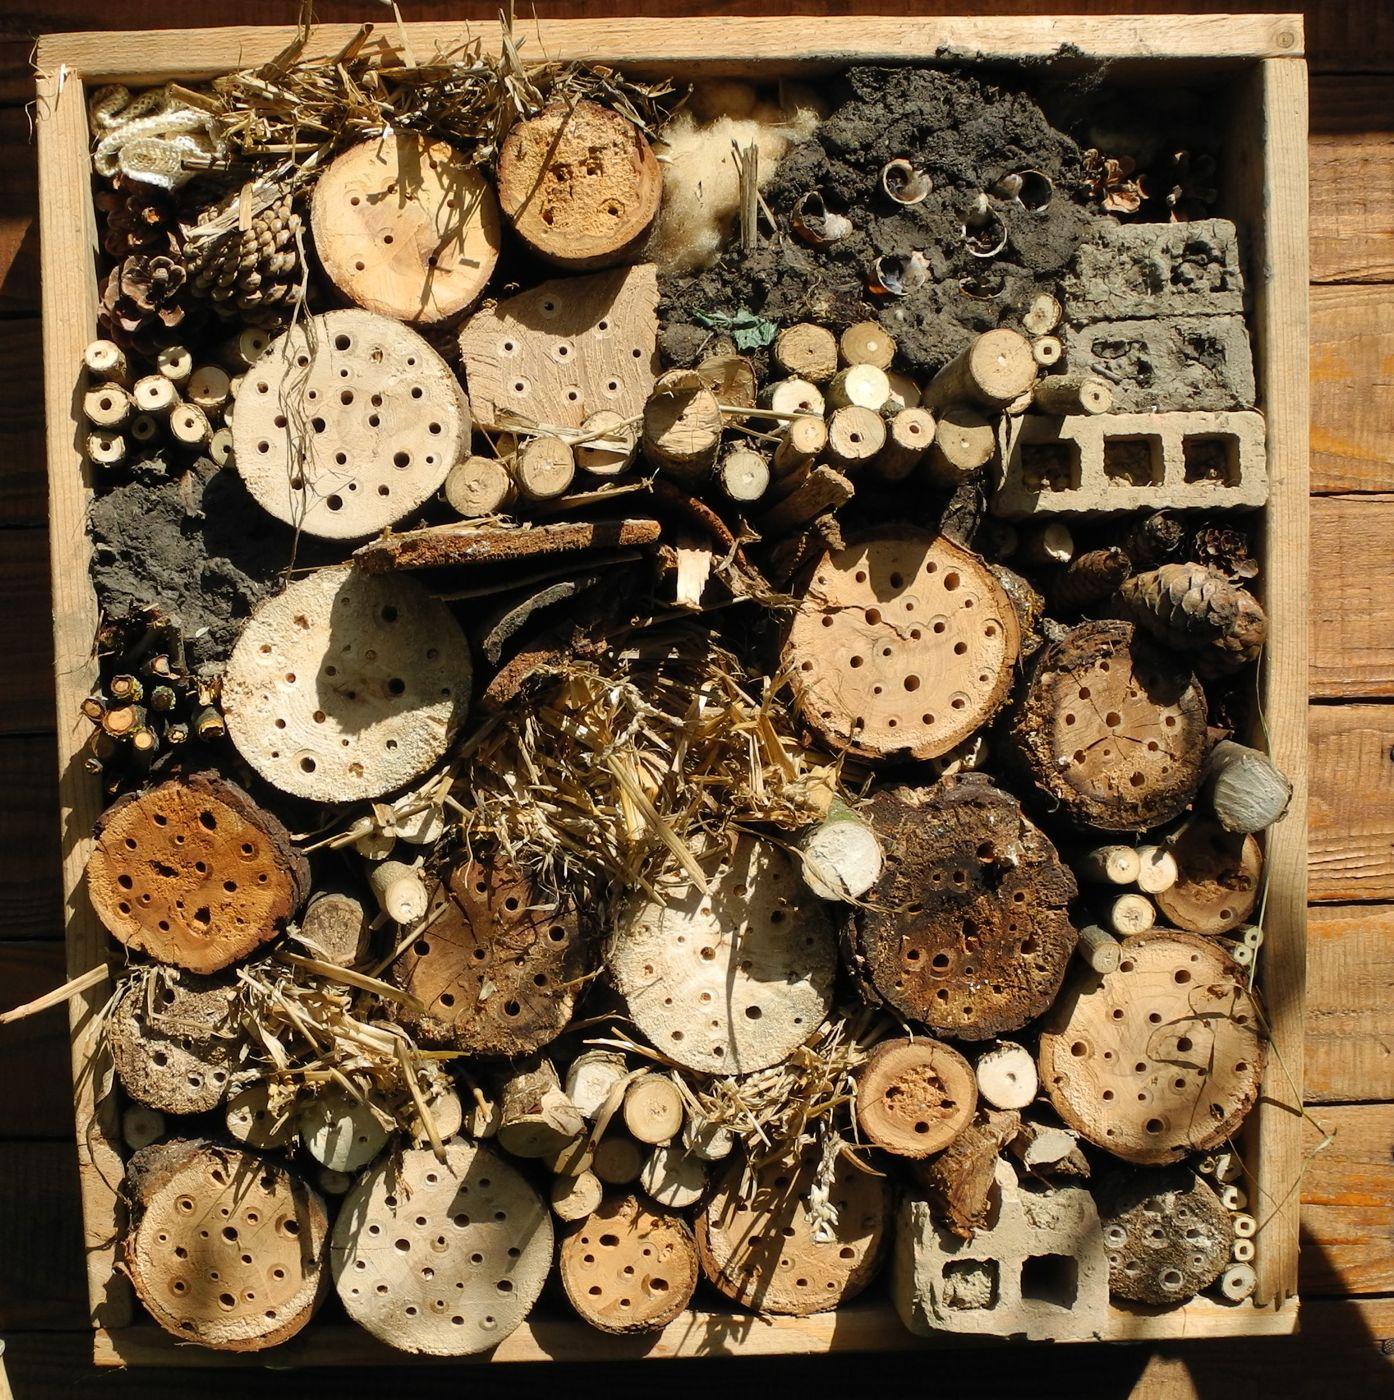 insektenhotel lebensraum permakultur. Black Bedroom Furniture Sets. Home Design Ideas